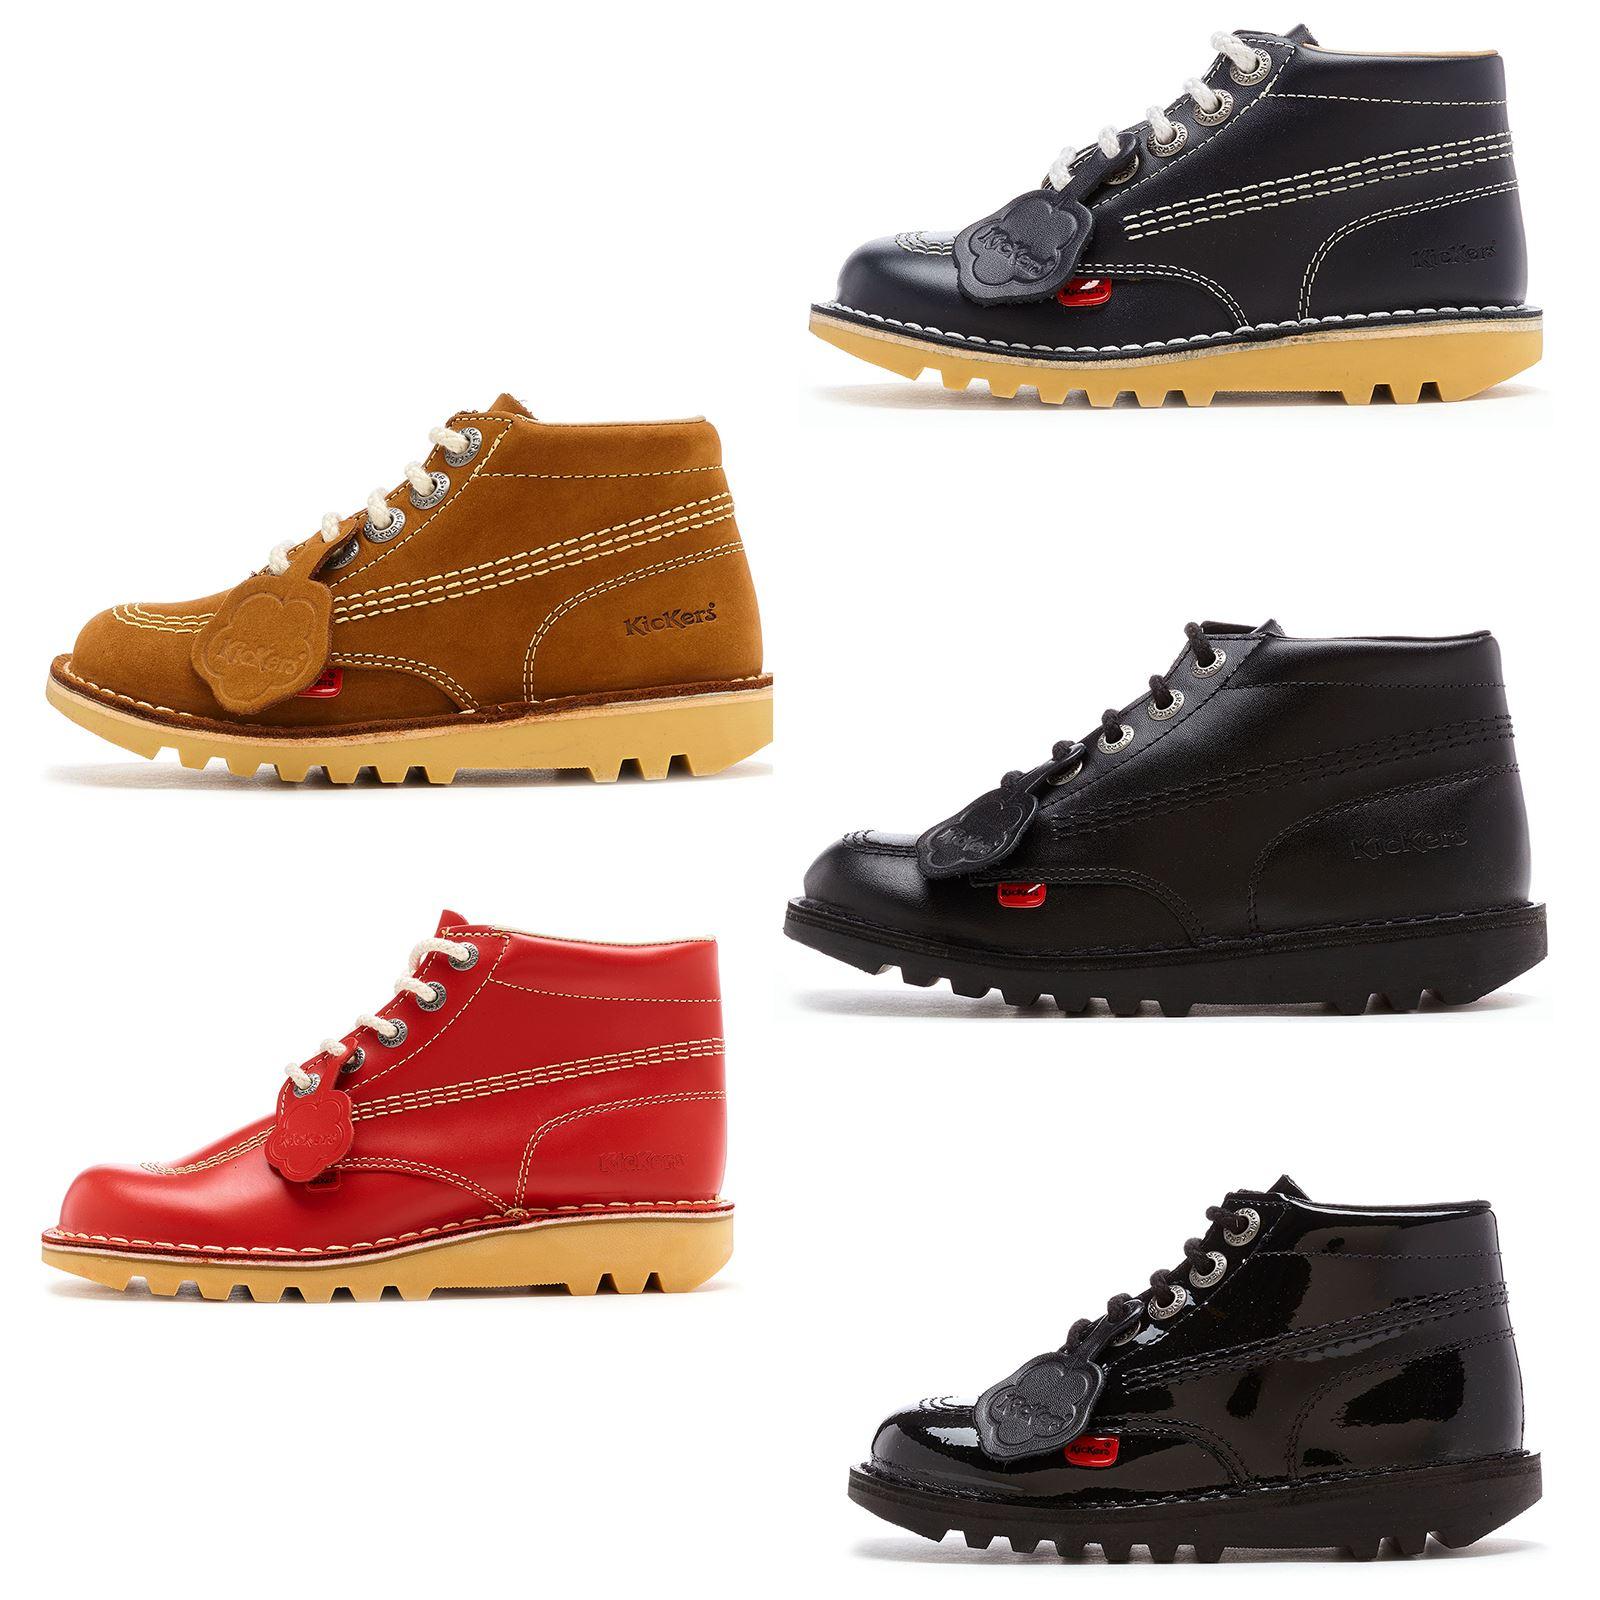 65b9e0fdd53ddc Kickers Kick Hi Core Kids bottines en cuir en noir, bleu, rouge & Tan